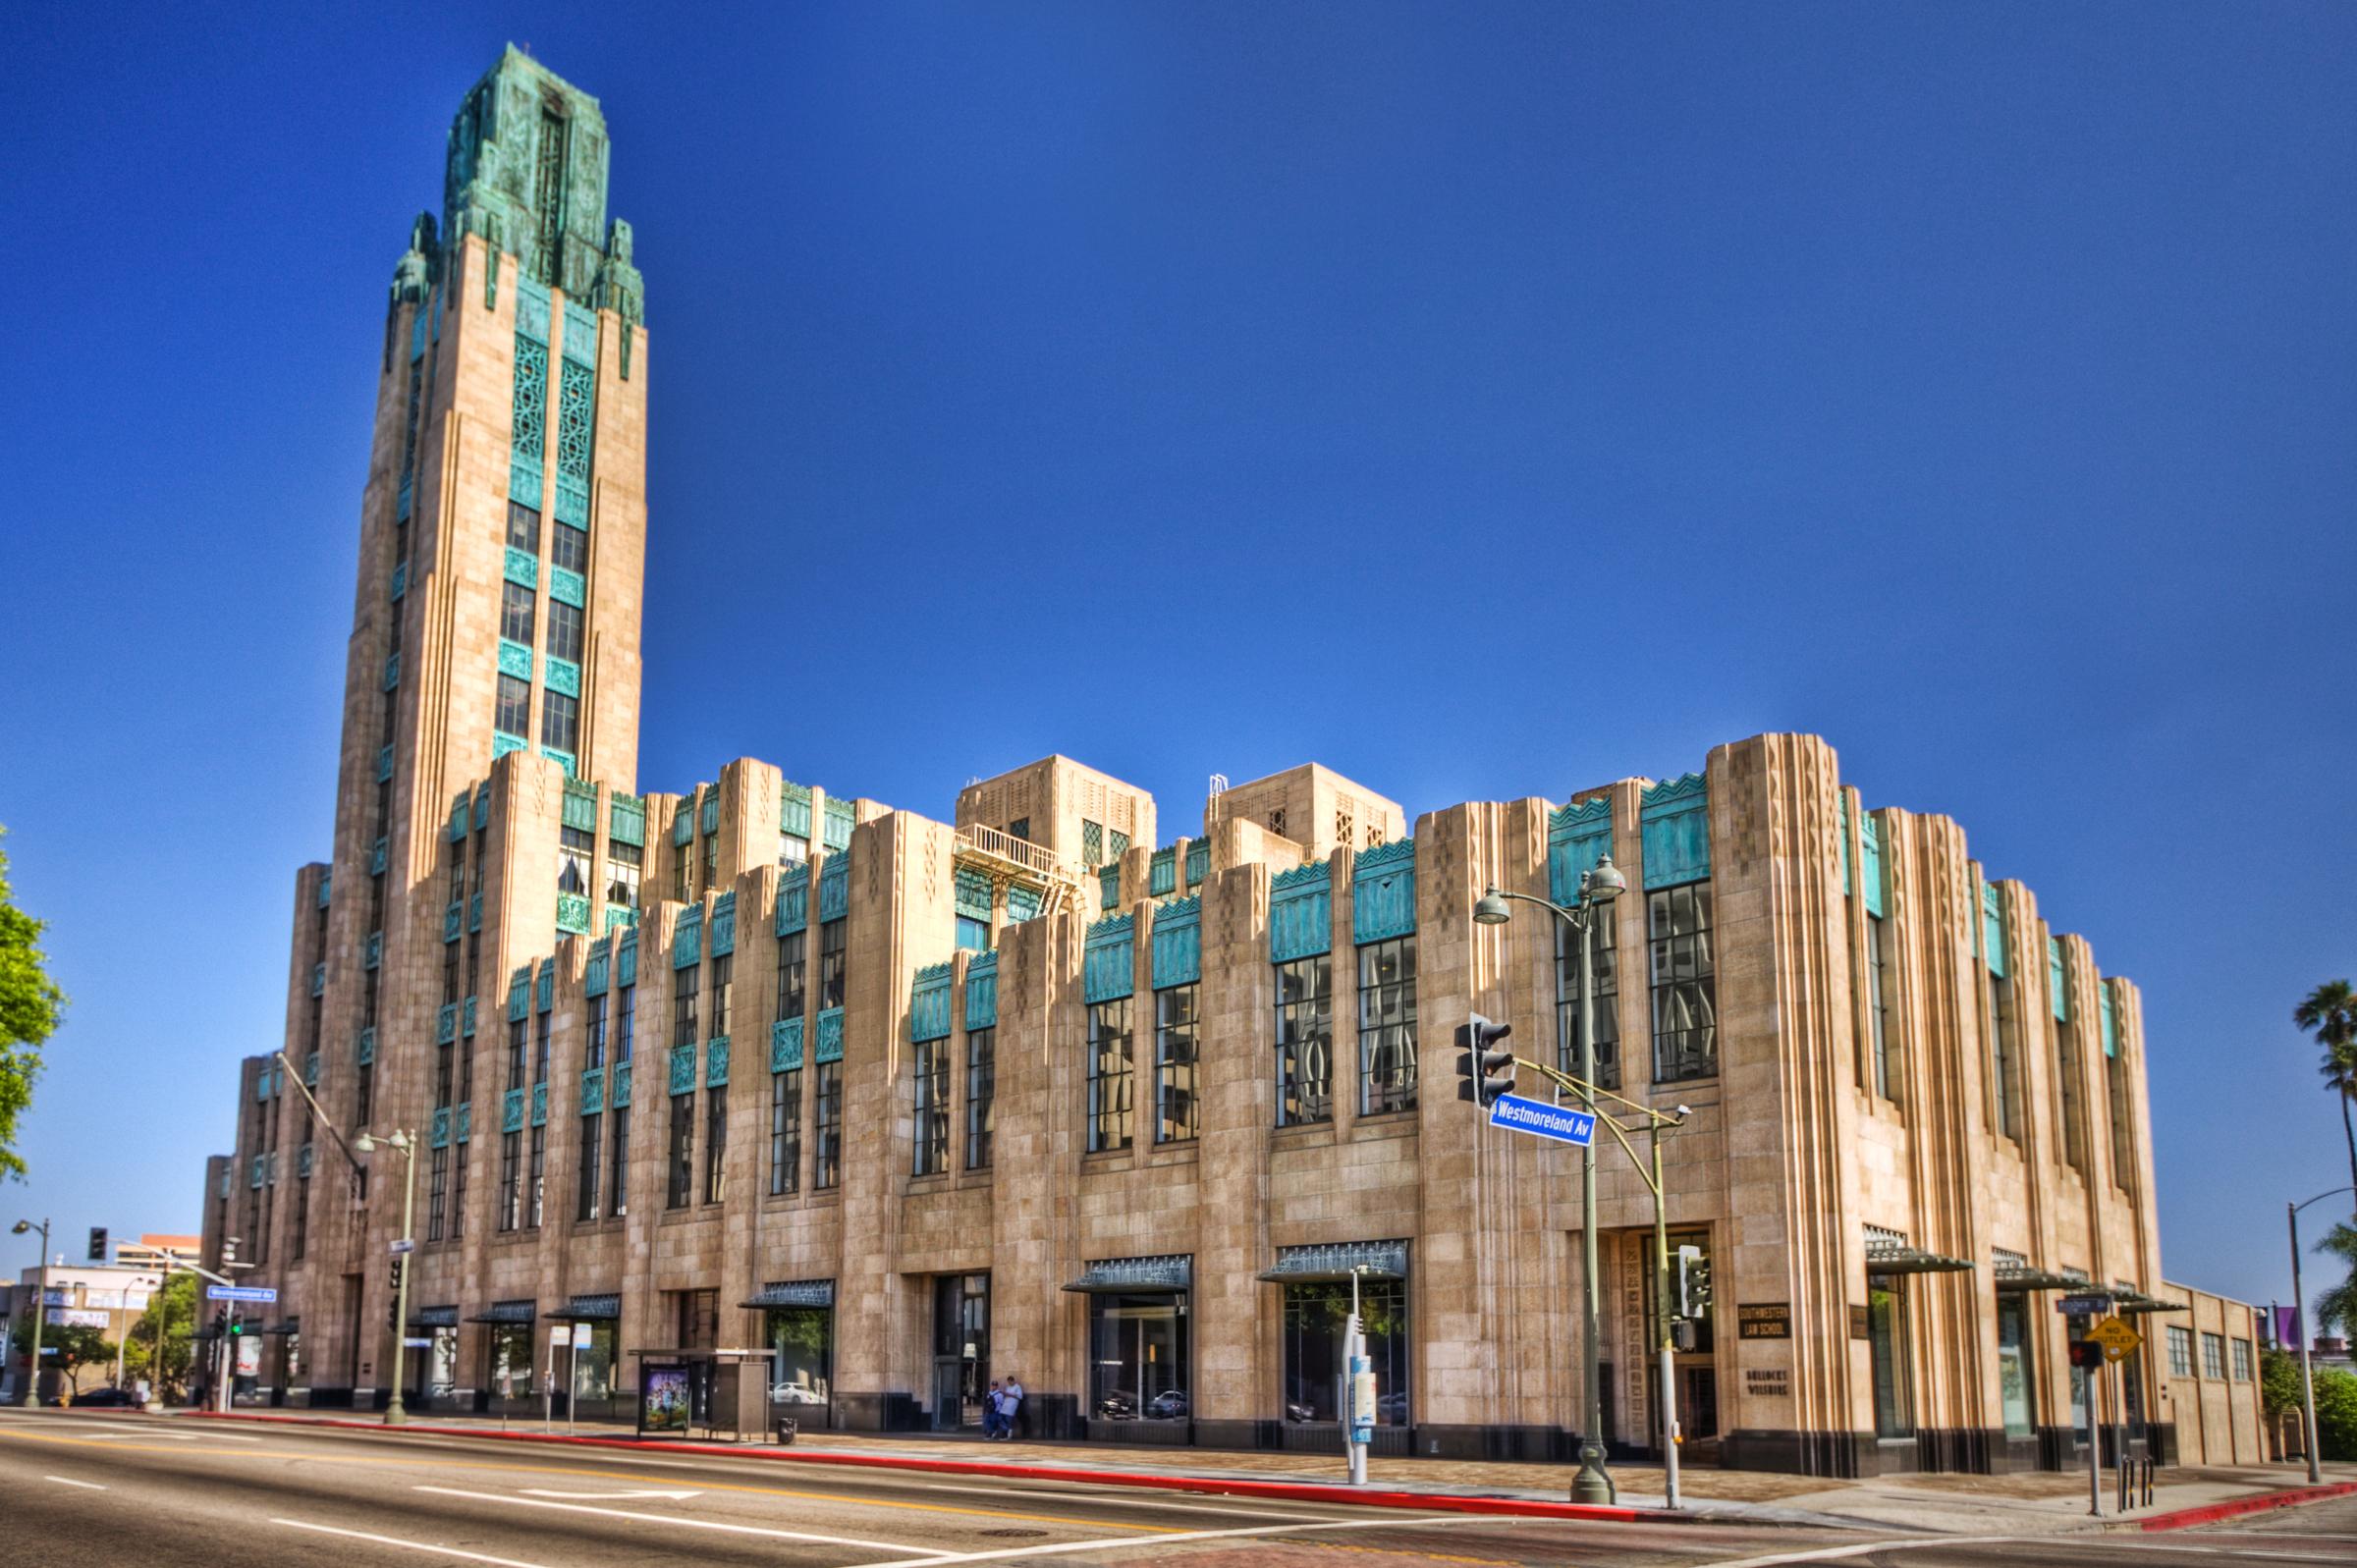 Los Angeles historical building renovations